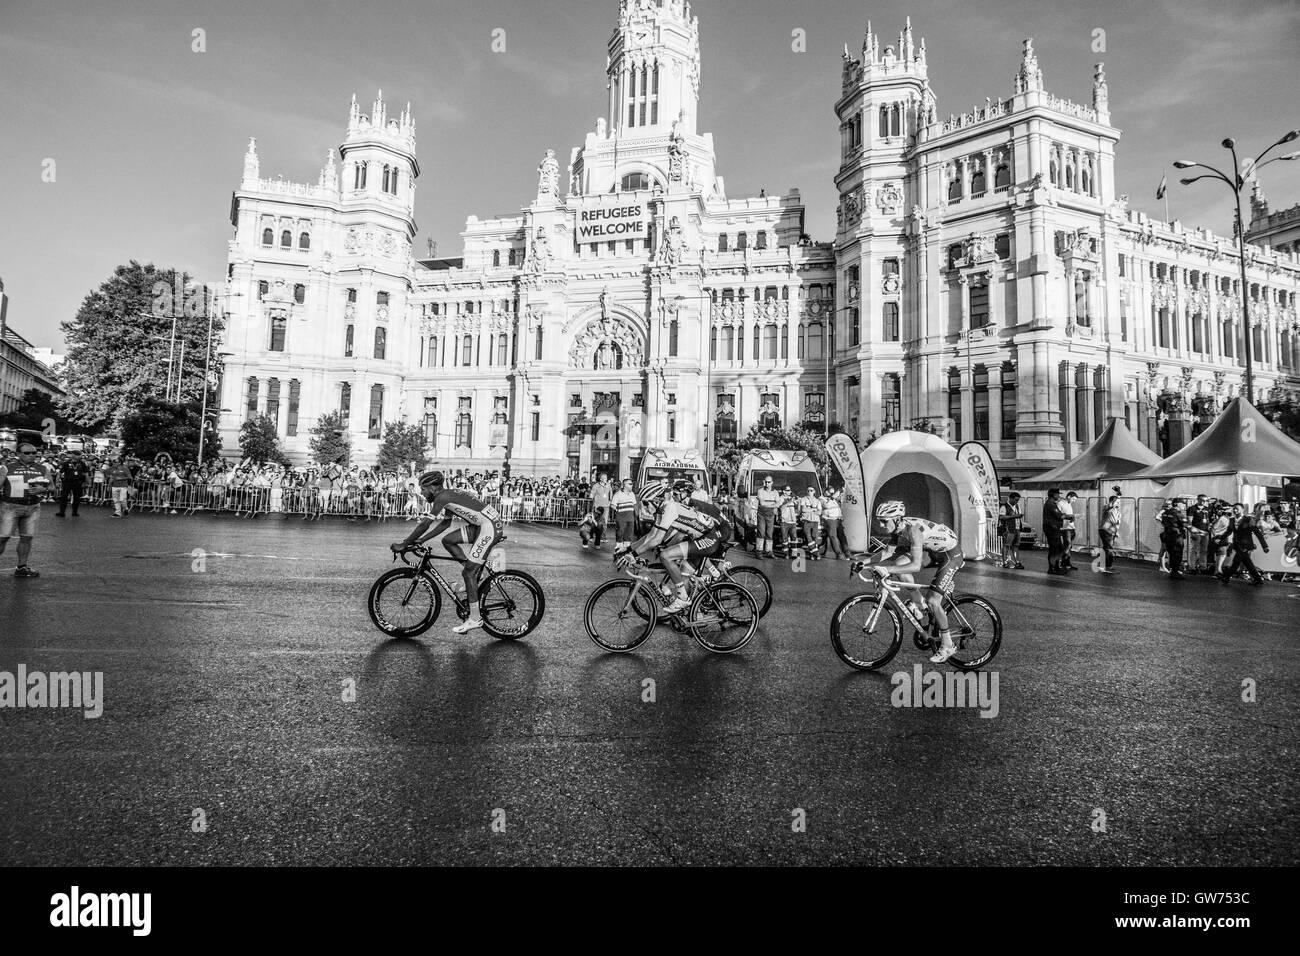 Madrid, Spain. 11th September, 2016. Loic Chetout (Cofidis), Peter Kennaugh (Team Sky), Koen Bownen (Lotto NL - - Stock Image